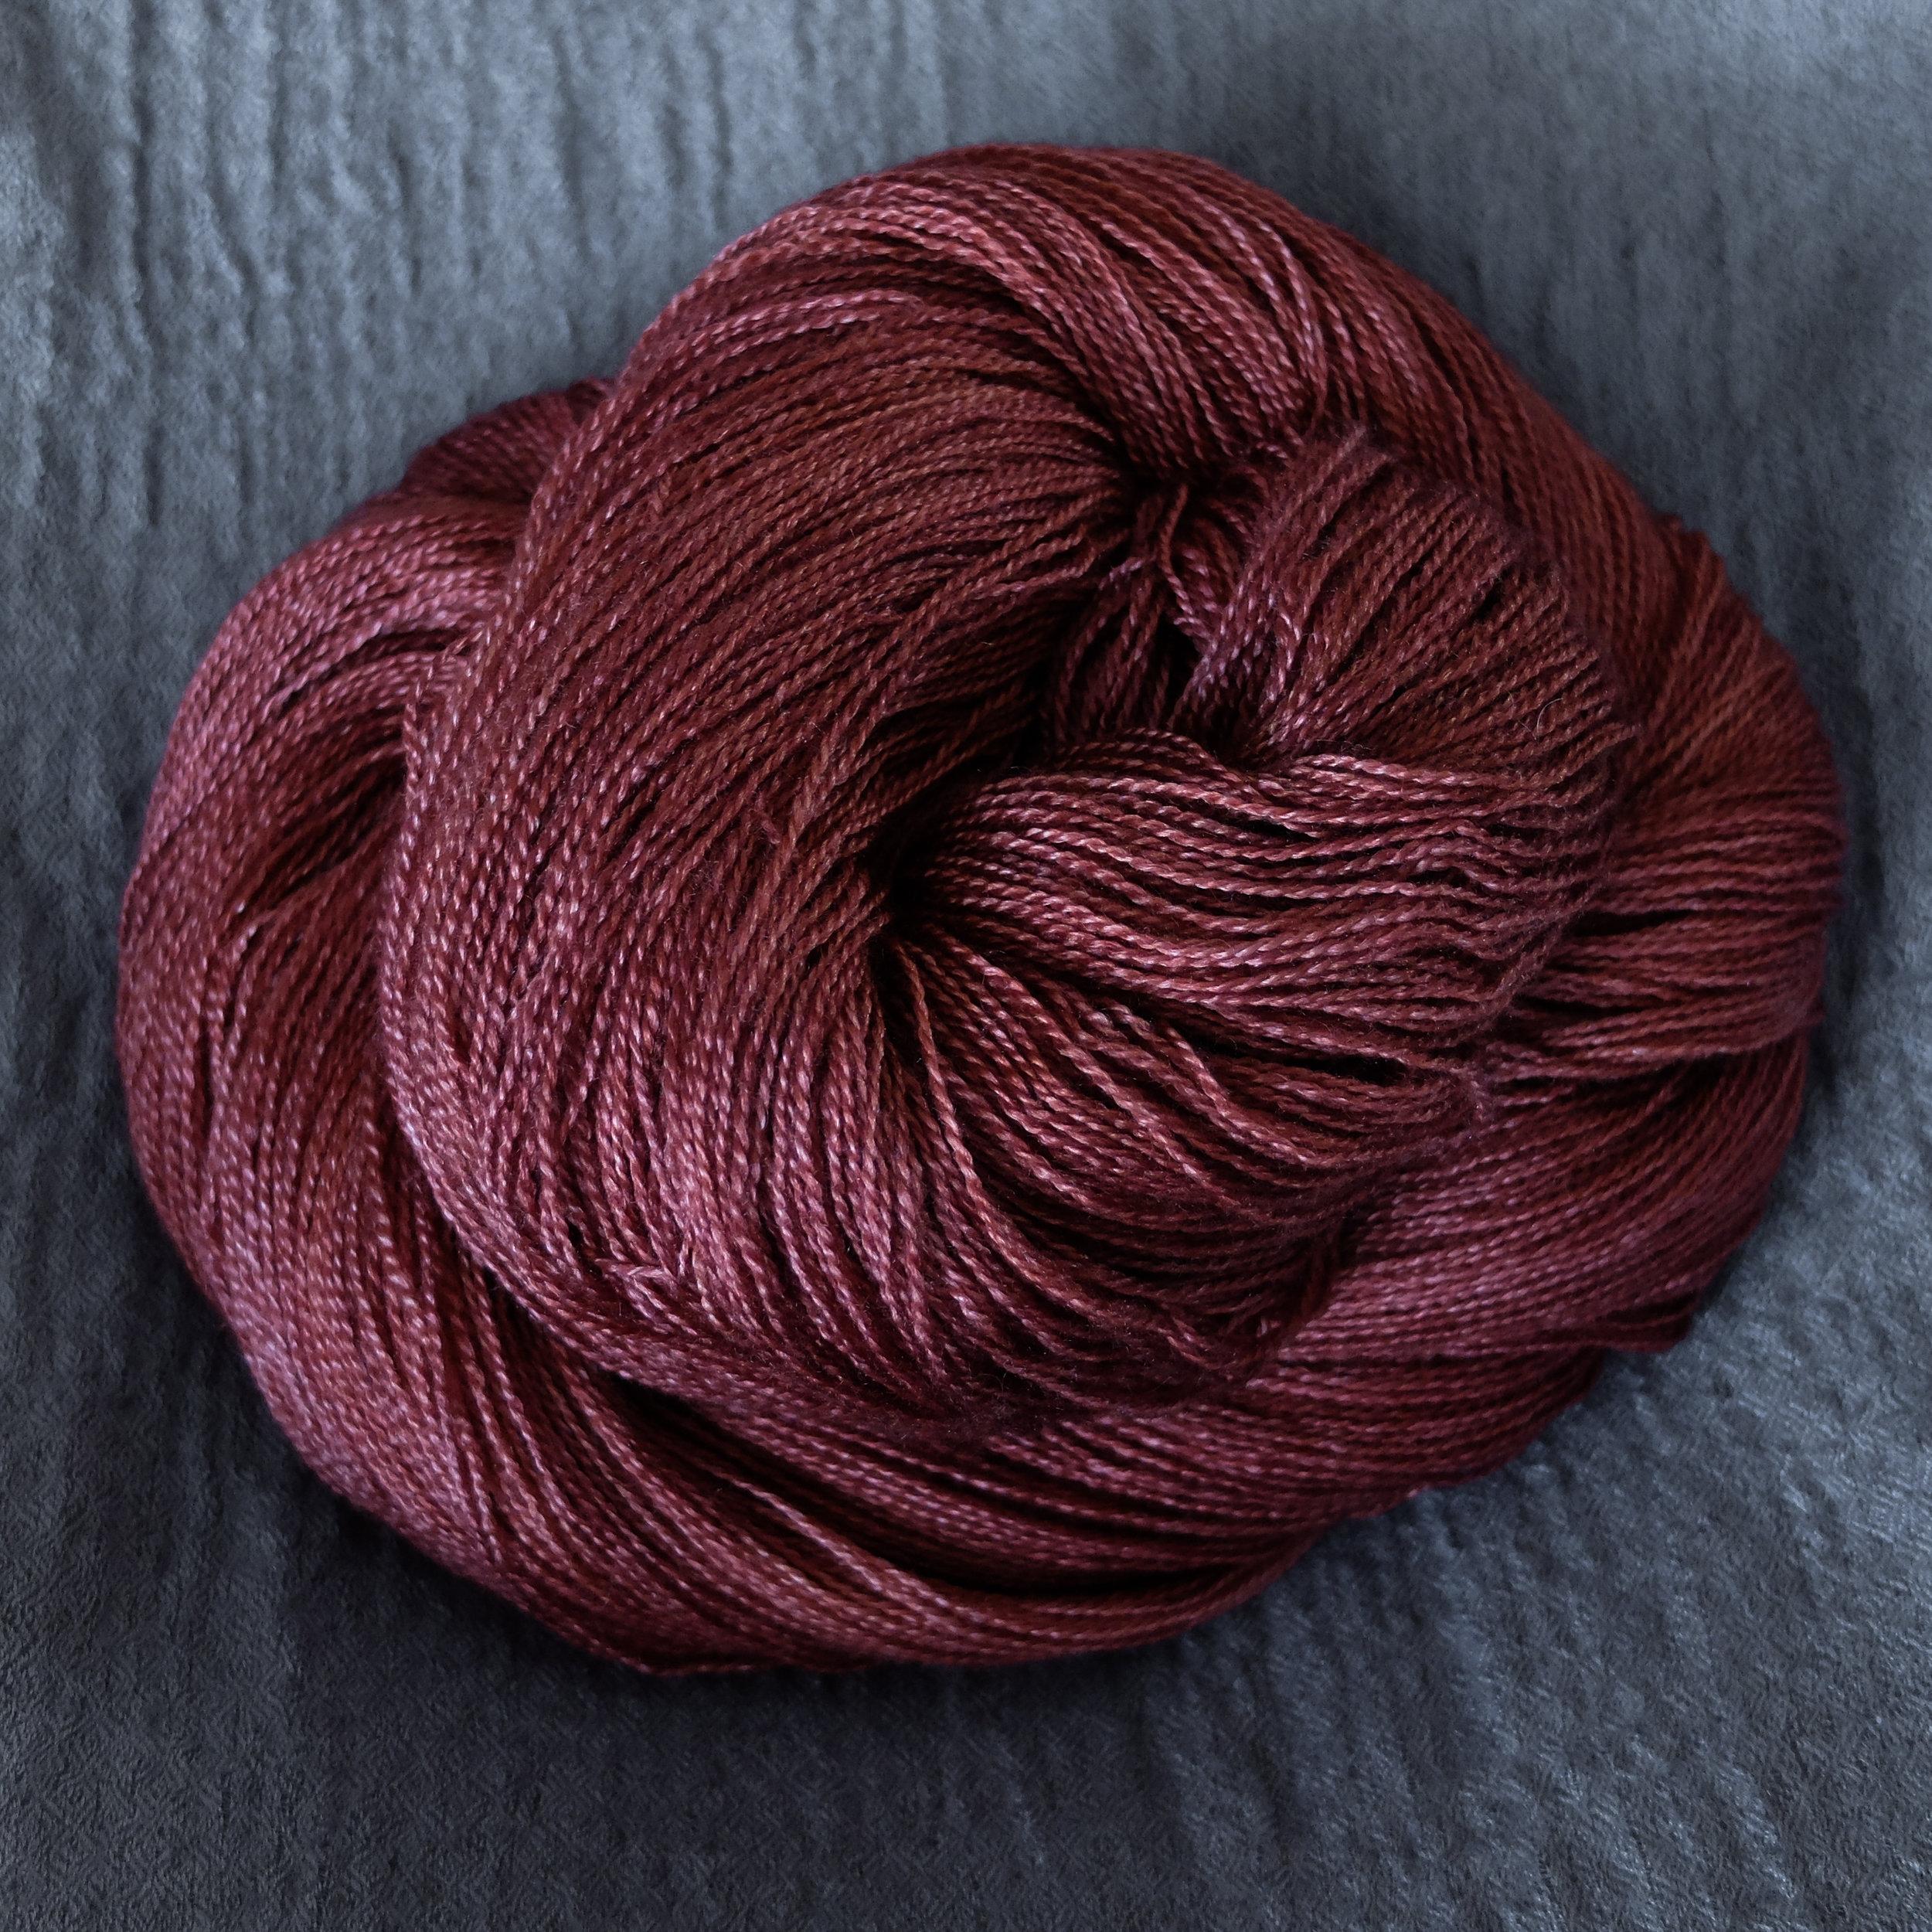 Ratatosk shown on Lace - BFL/Silk